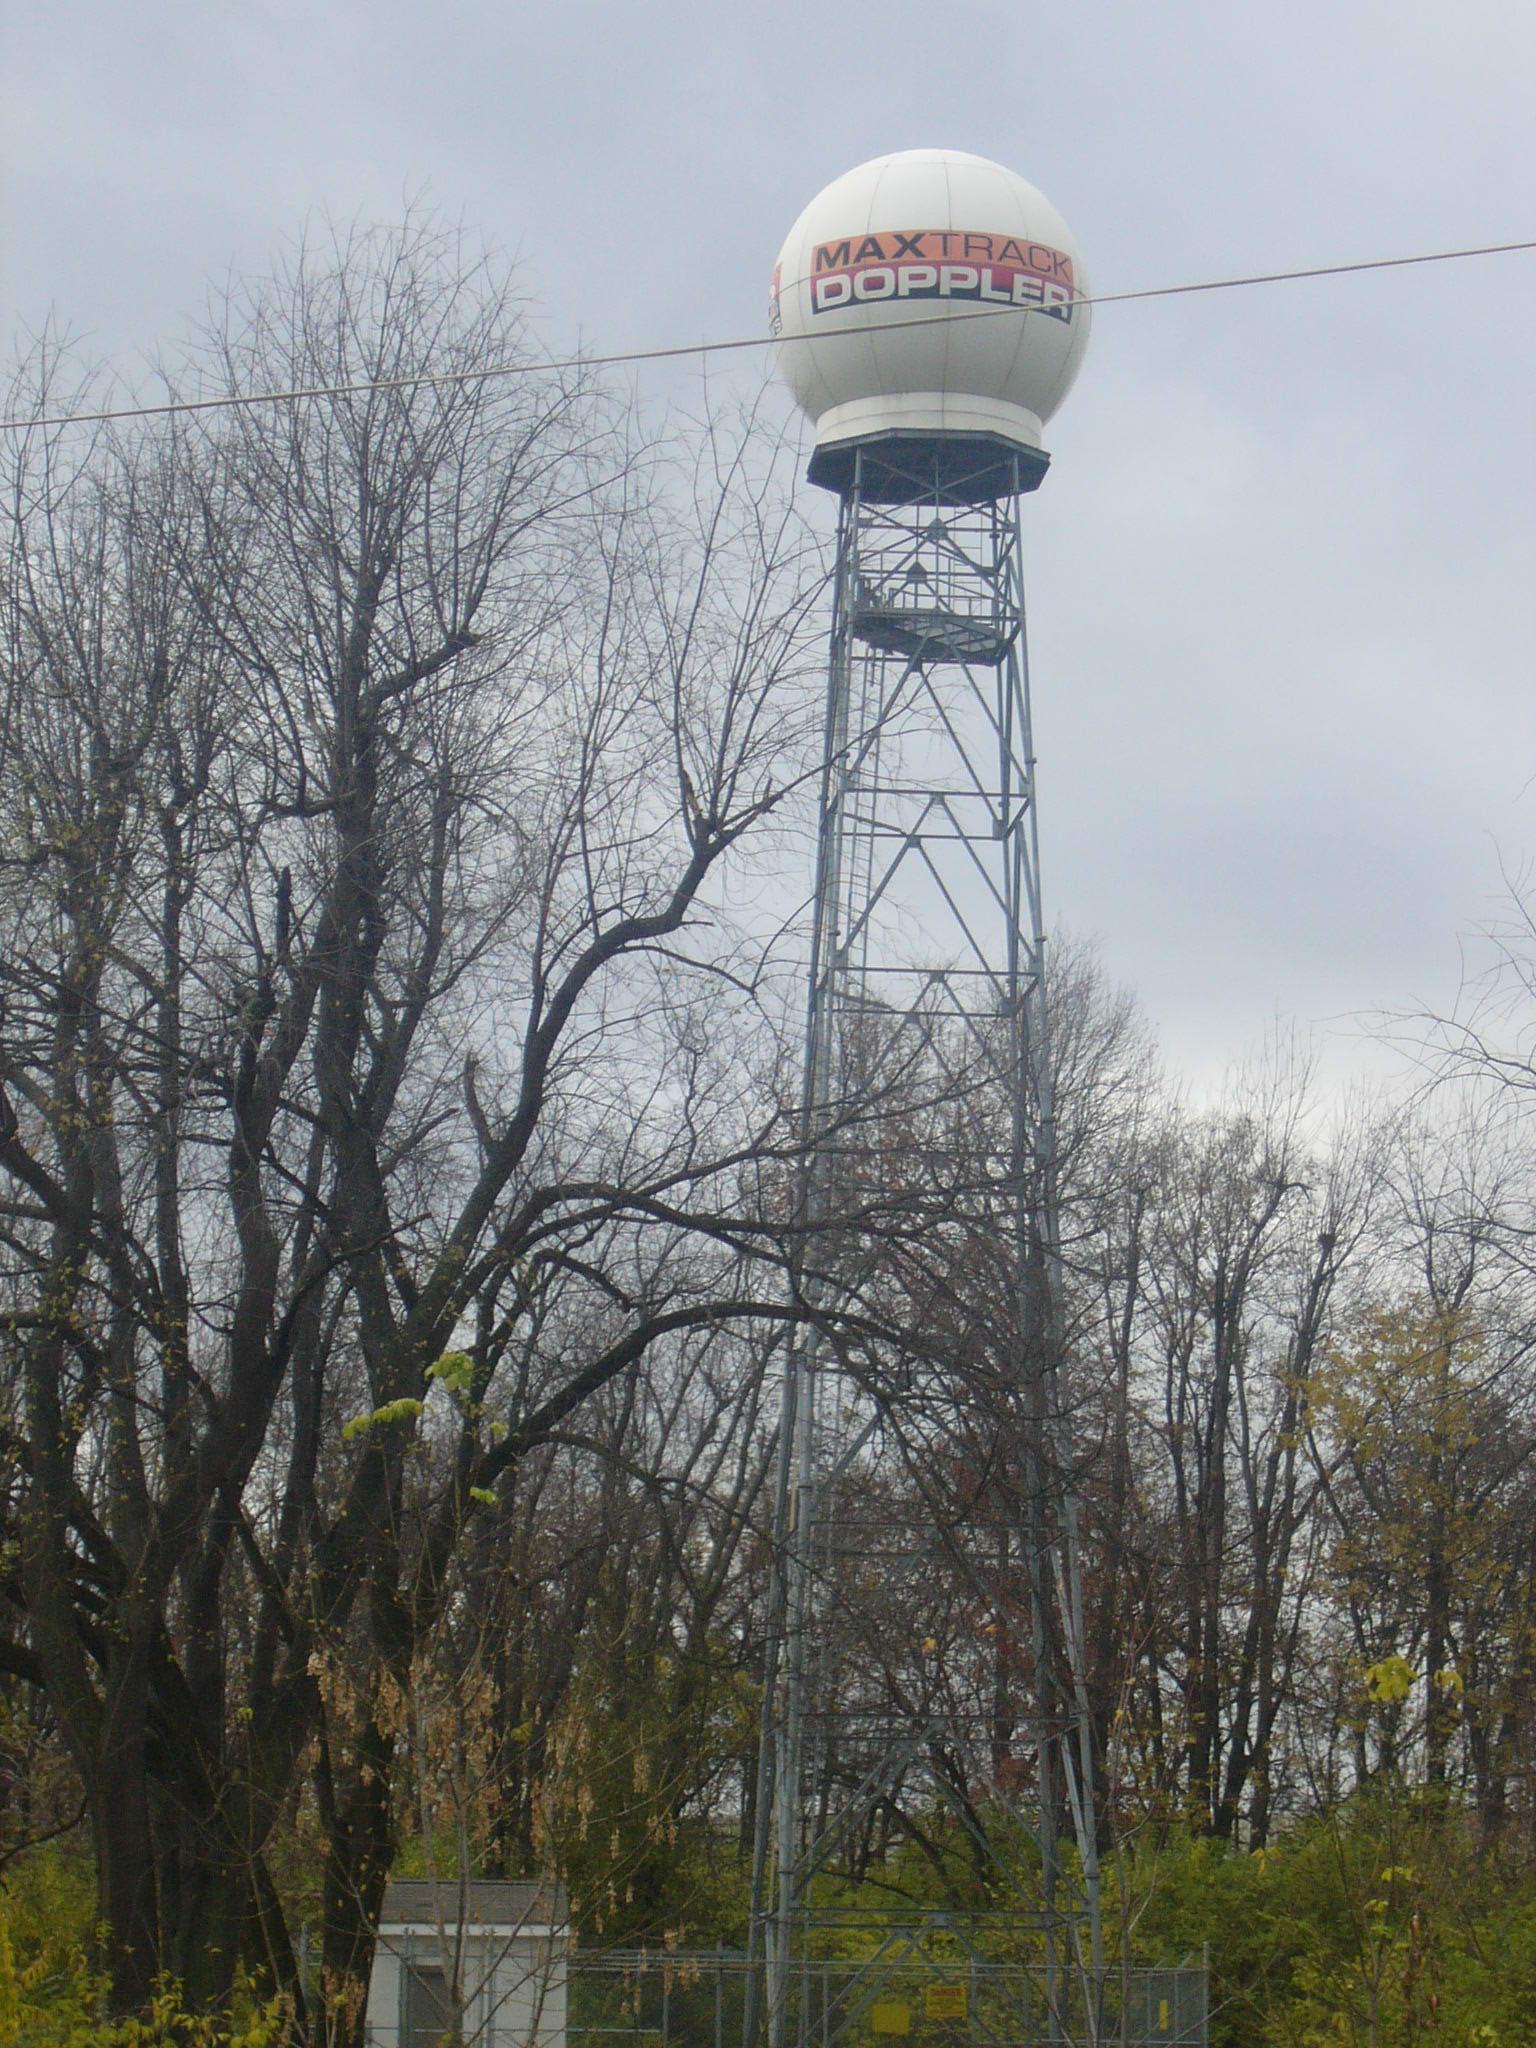 Max Track Live Doppler Radar - Lexington, KY Image